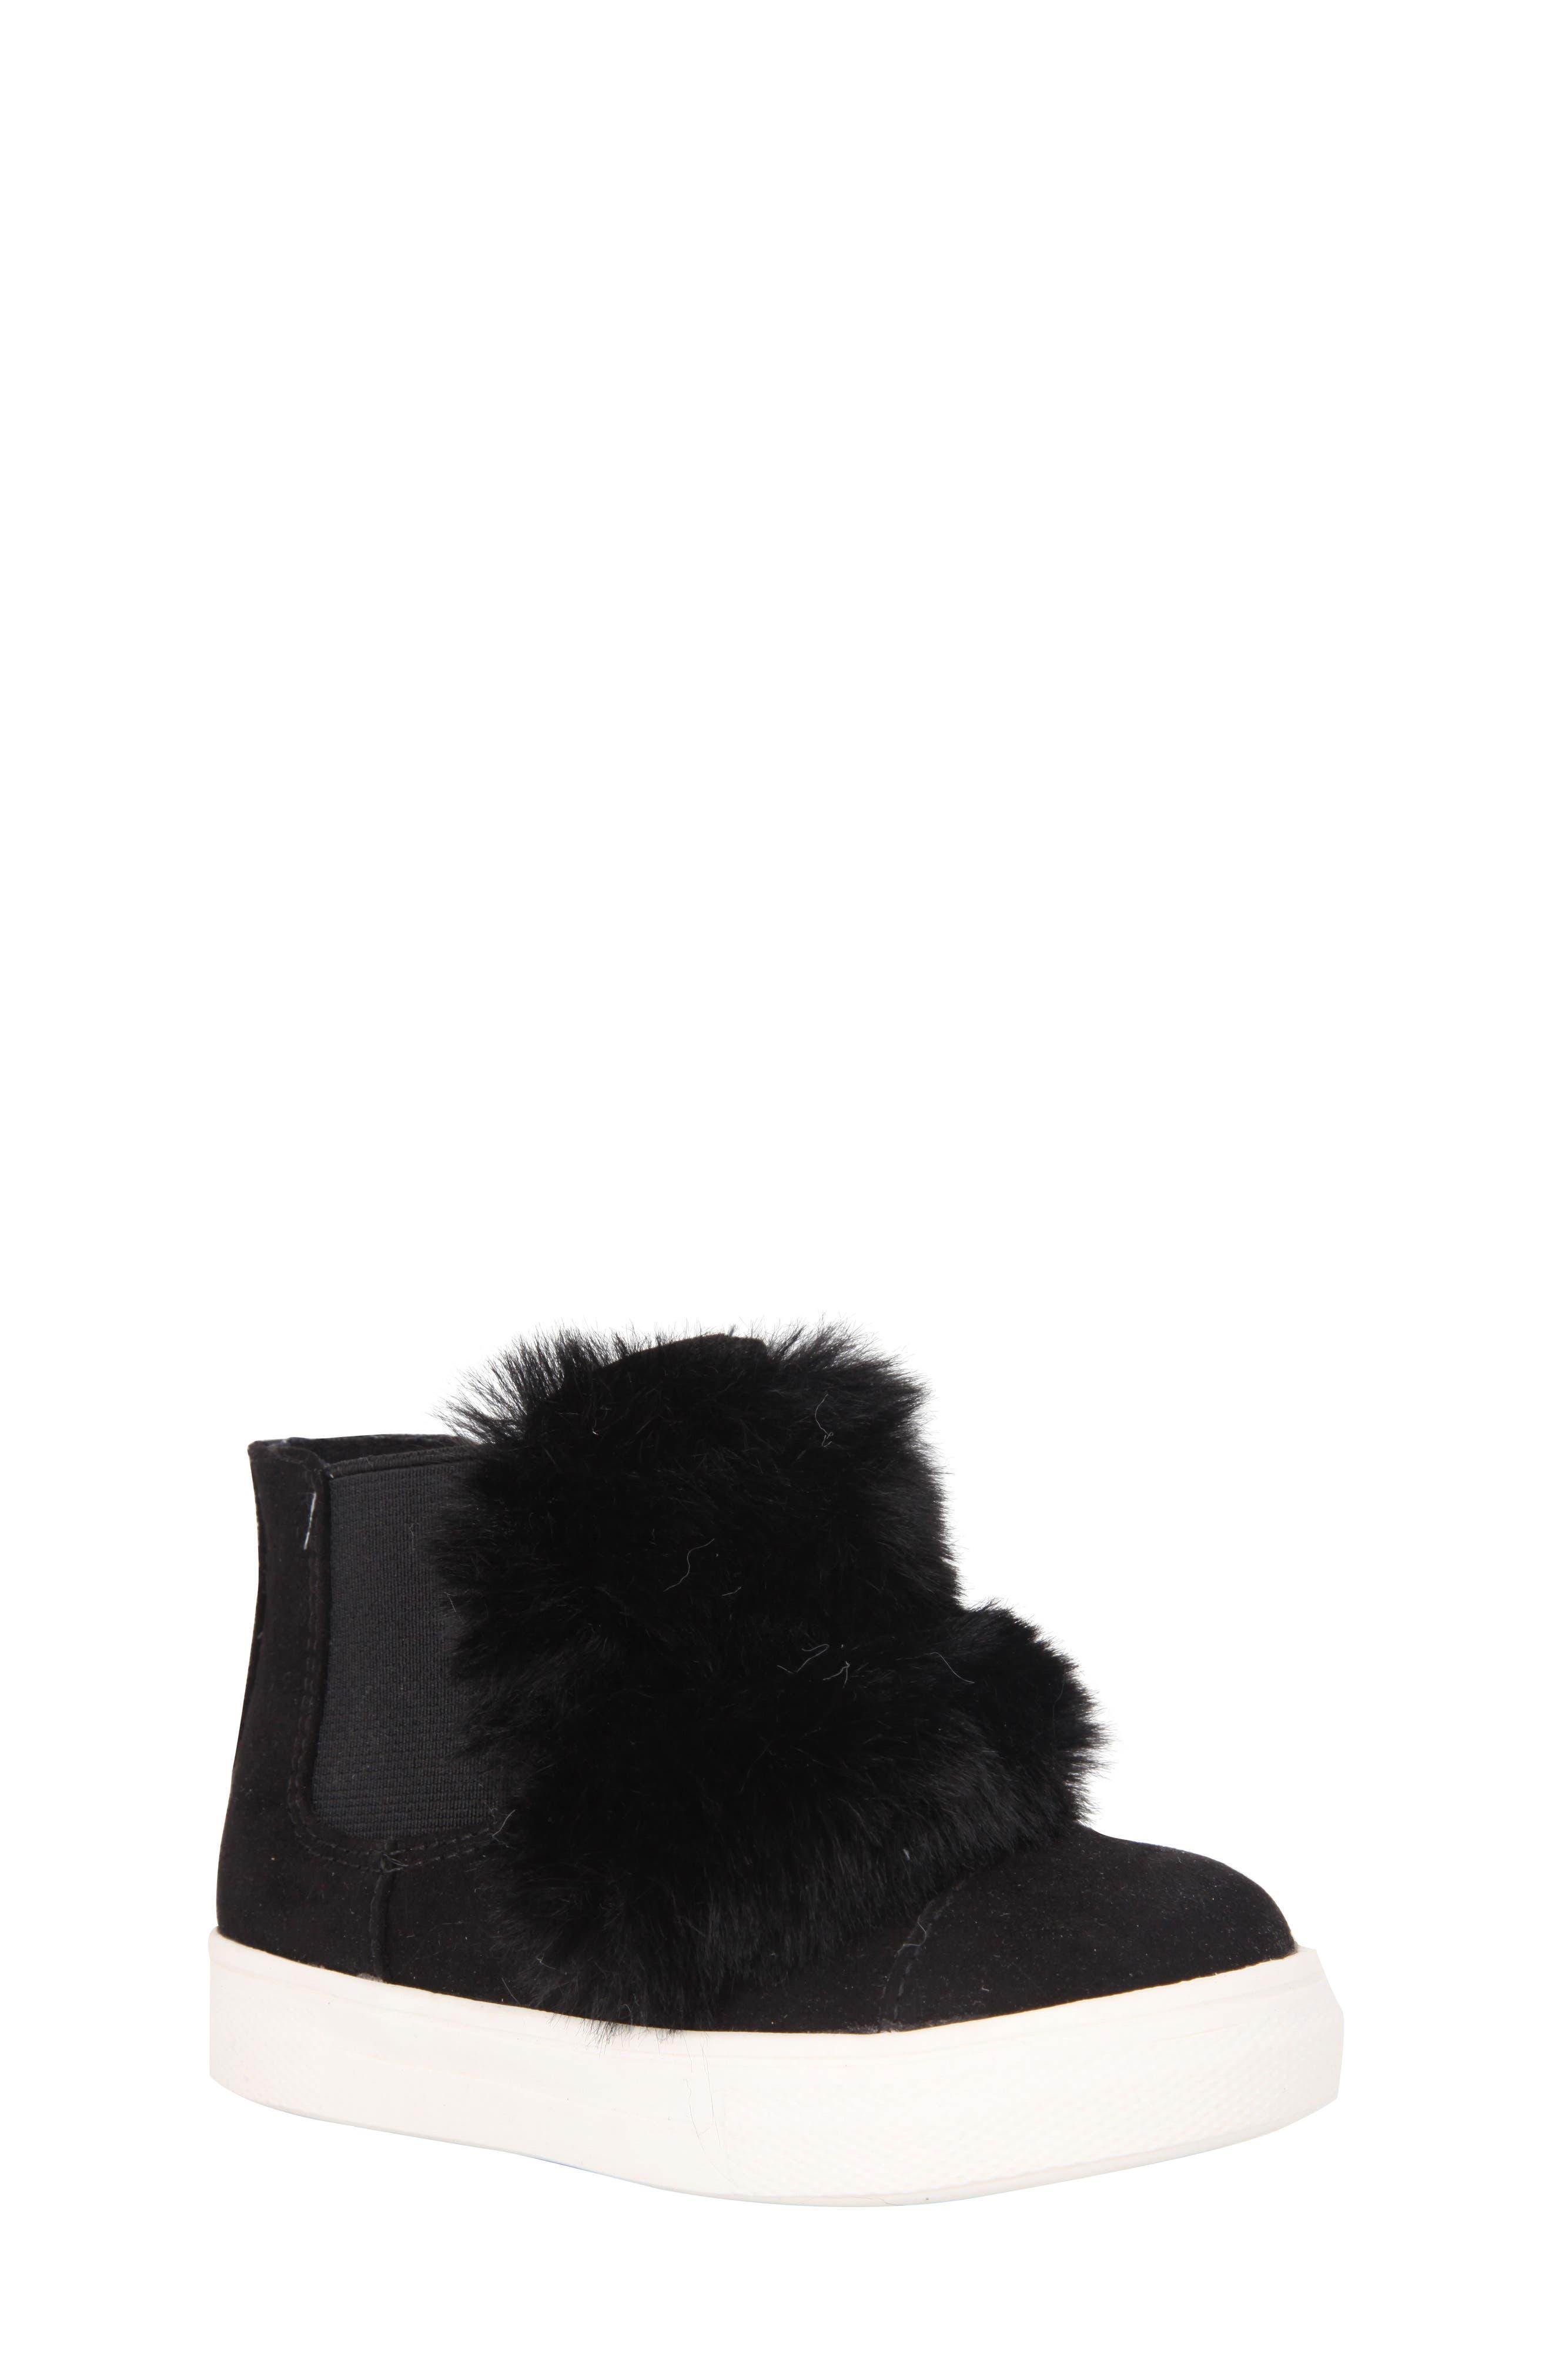 Helen Faux Fur Bootie Sneaker,                             Main thumbnail 1, color,                             Black Microsuede